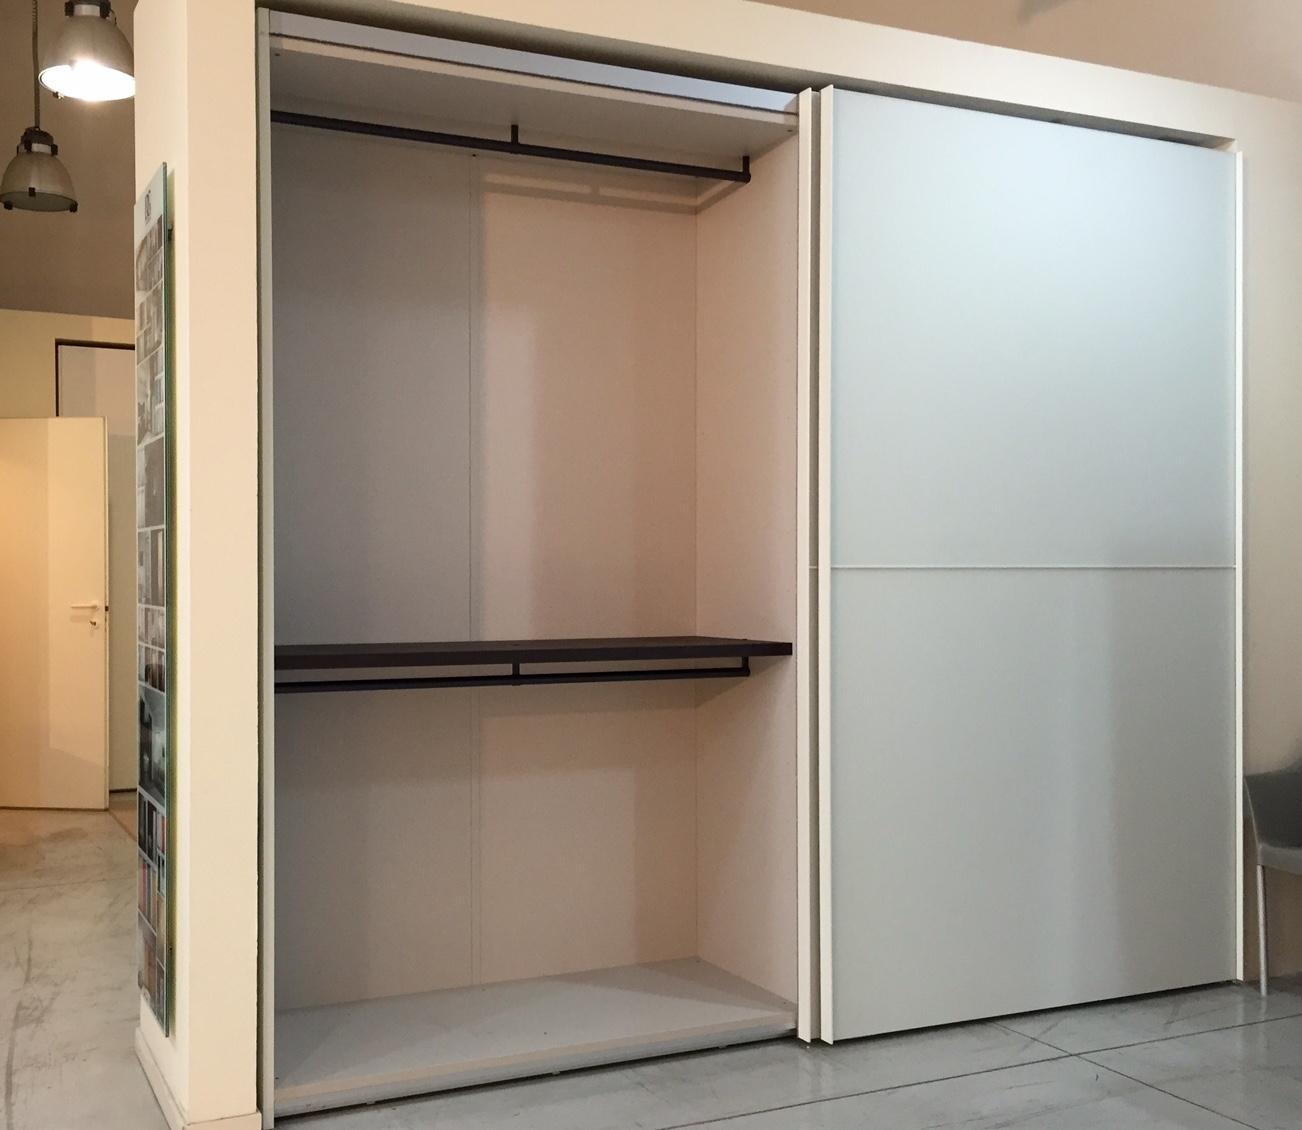 Armadio sangiacomo twin vetro satinato bianco design - Armadi porte scorrevoli ...